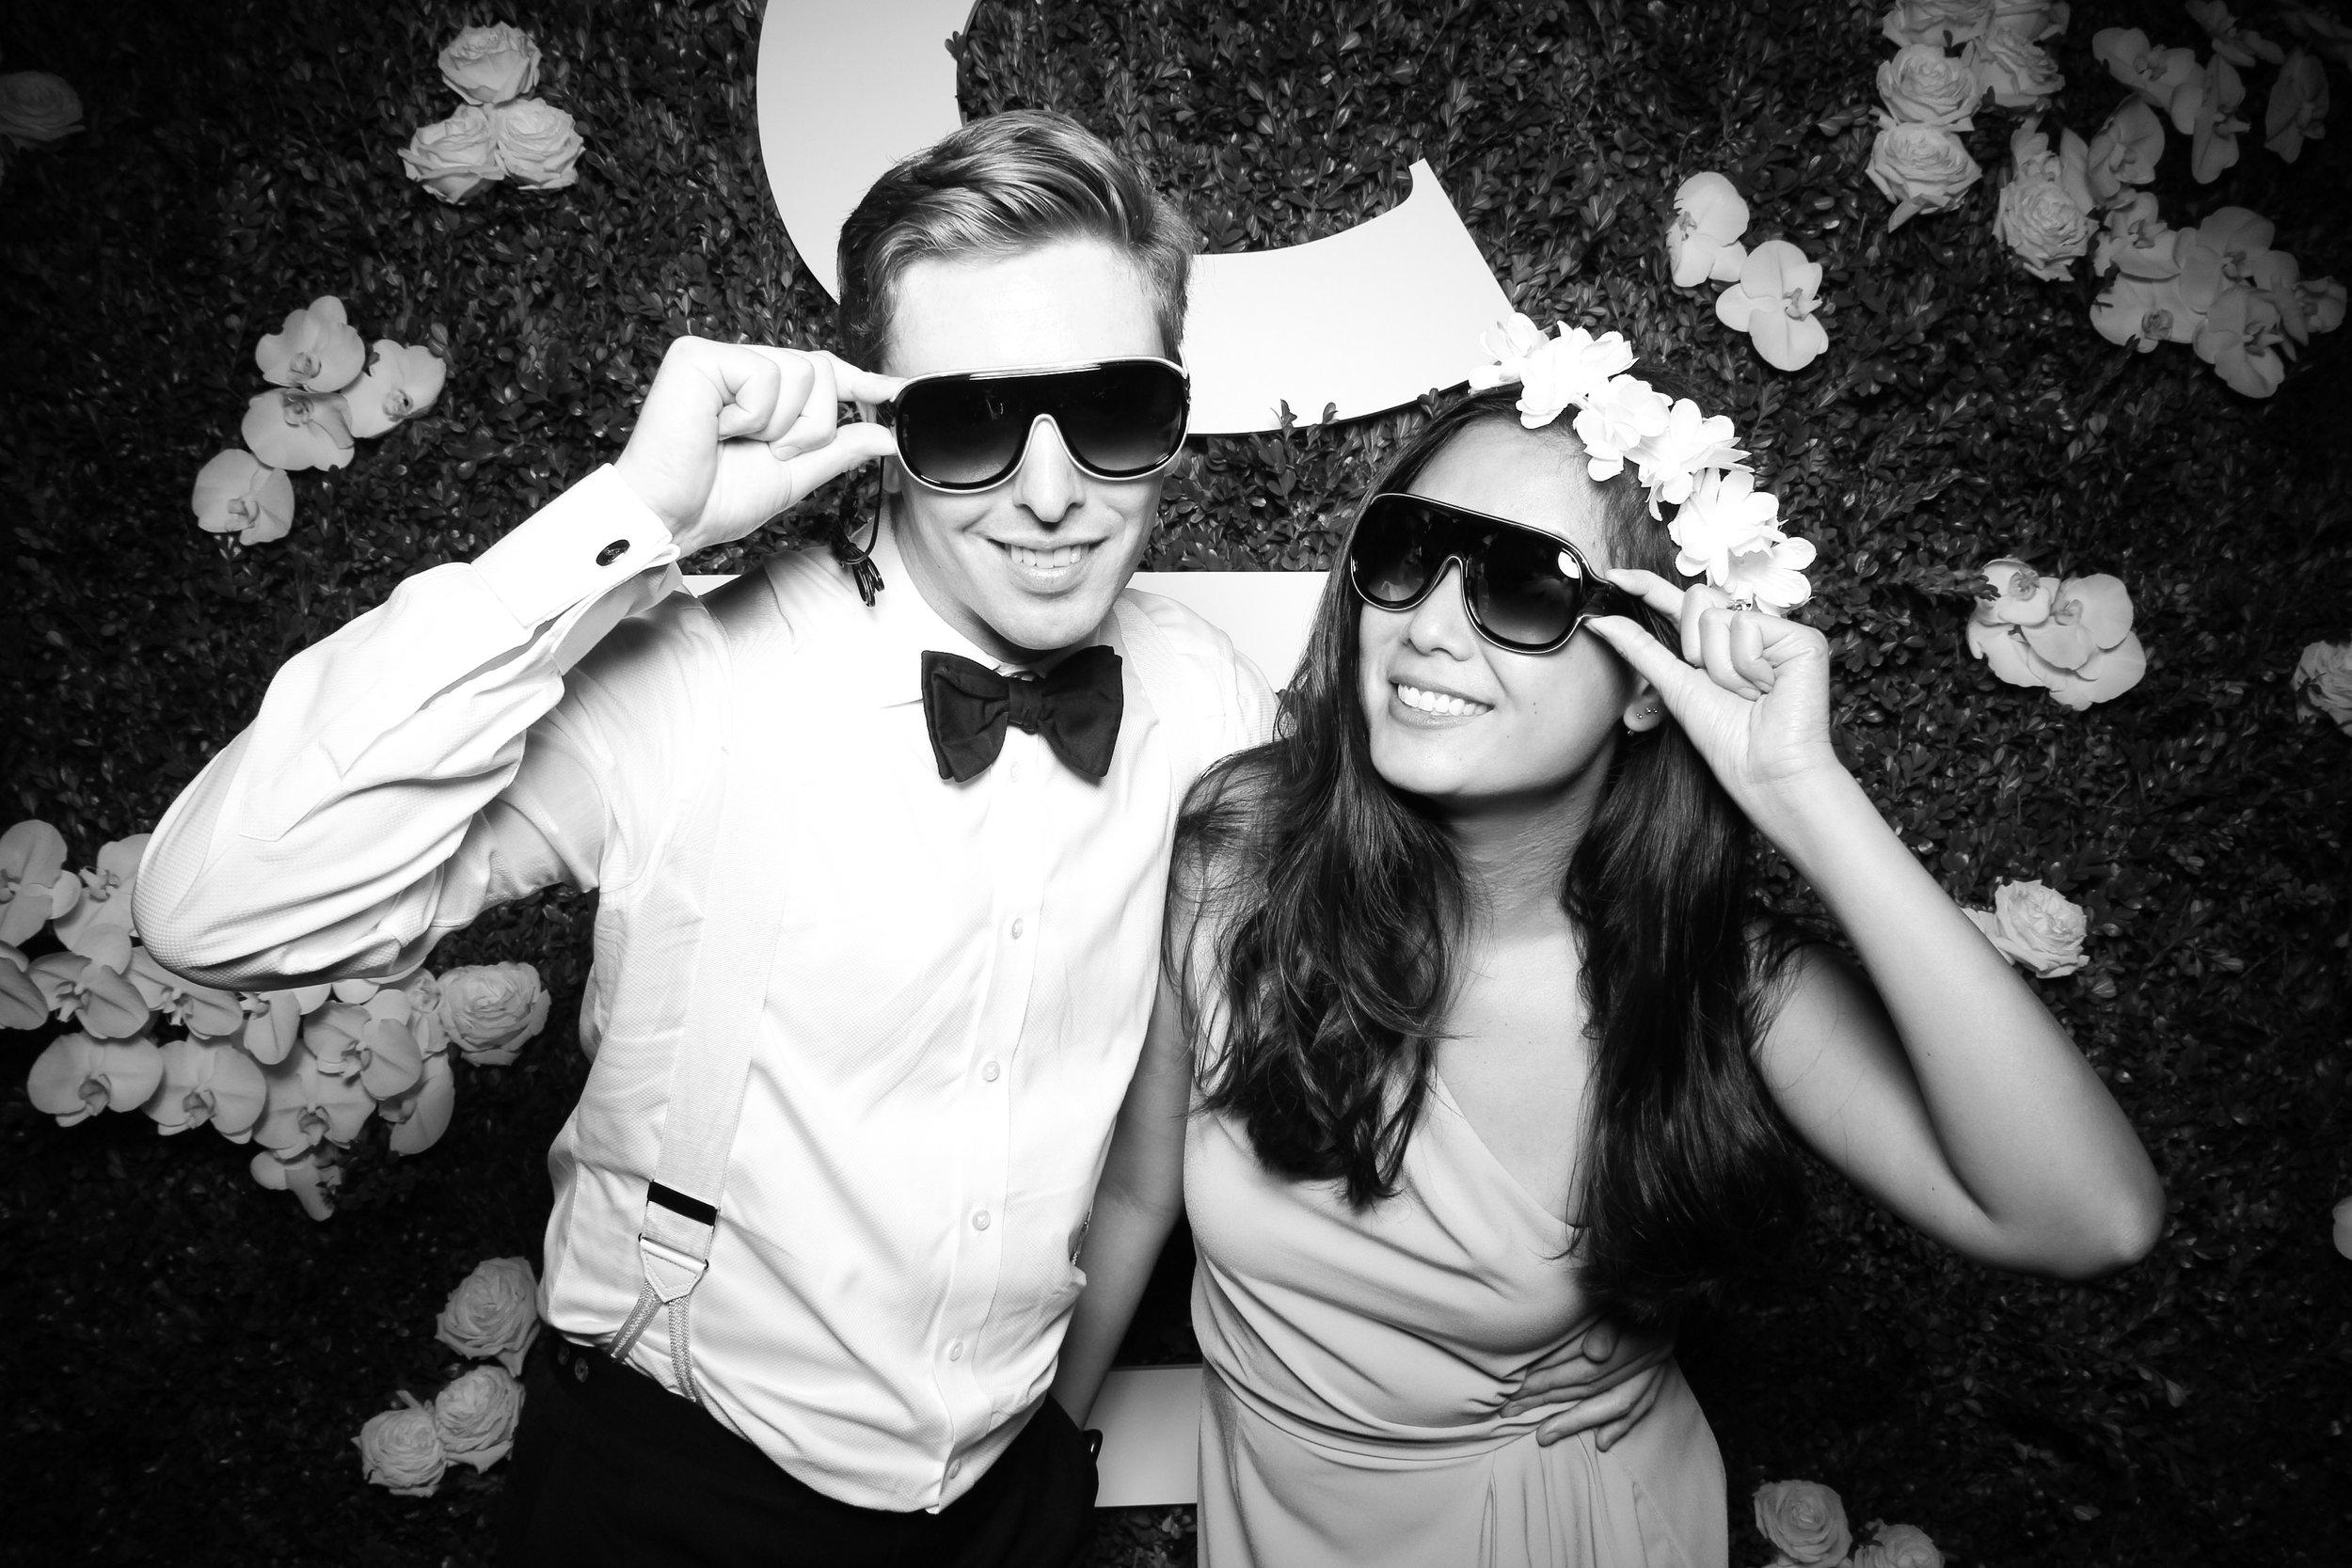 Peninsula_Hotel_Chicago_Wedding_Photo_Booth_27.jpg